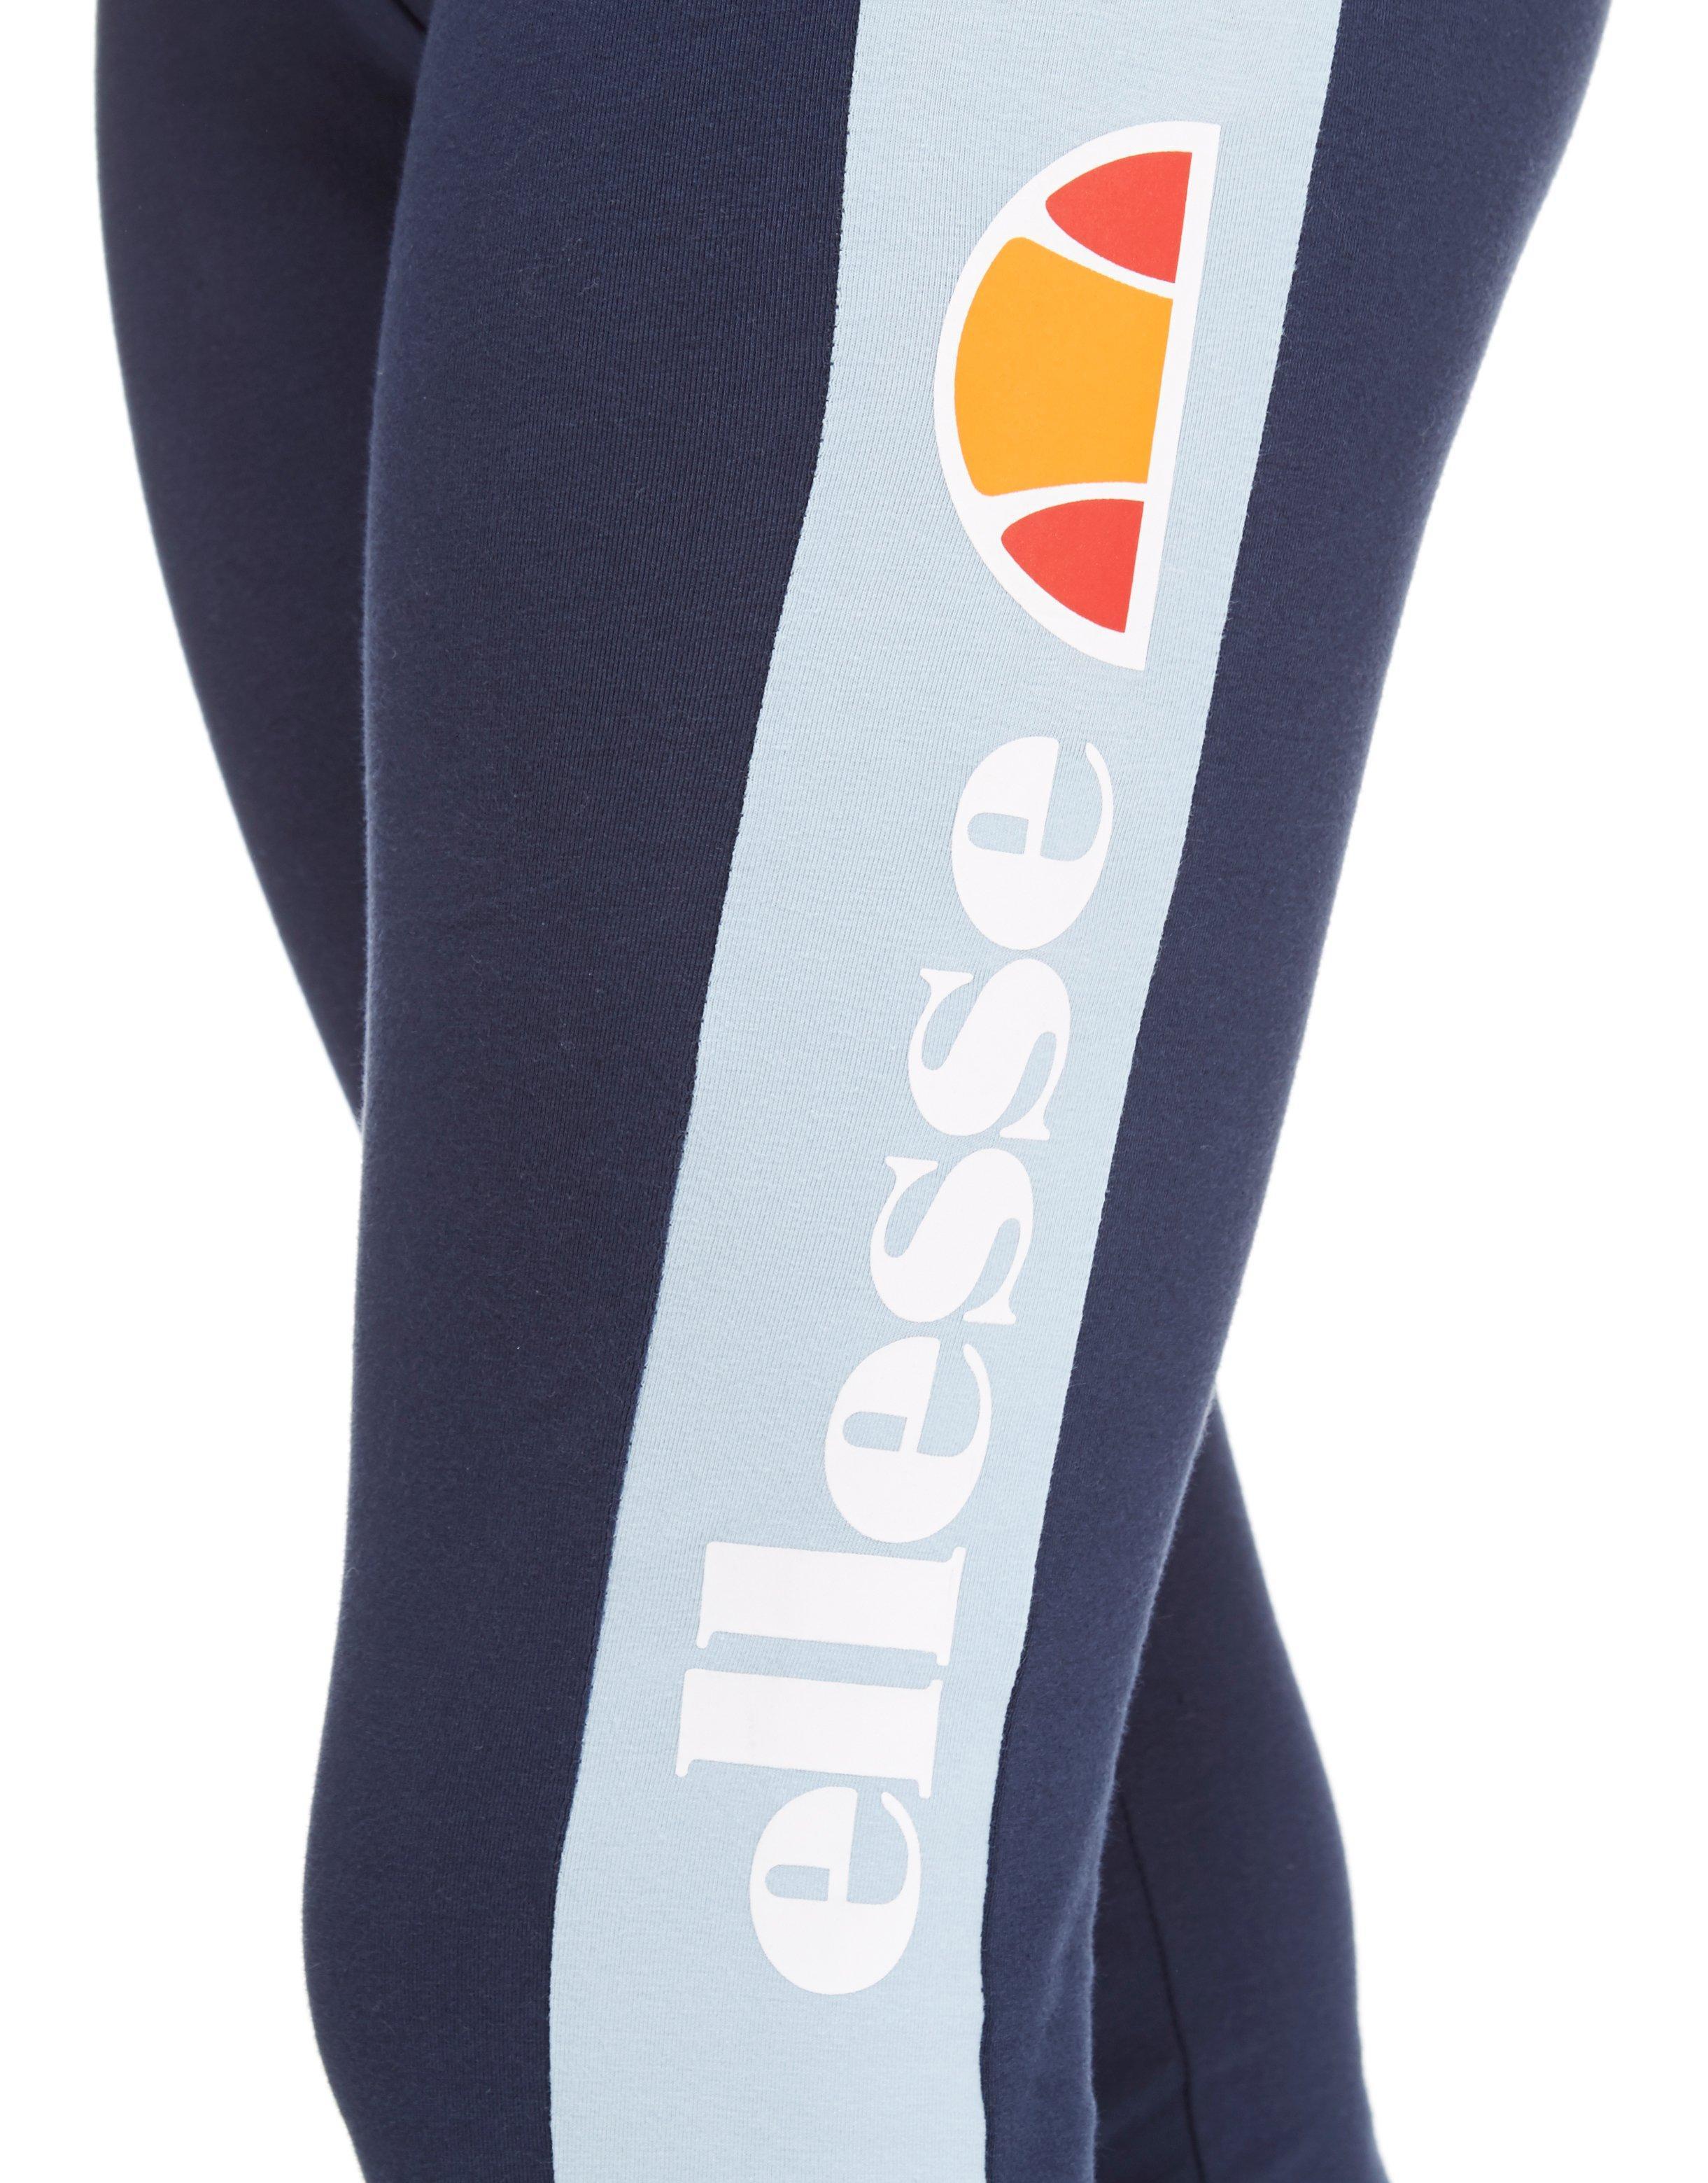 d889315dc2b9cc Ellesse Giotto Leggings in Blue - Lyst